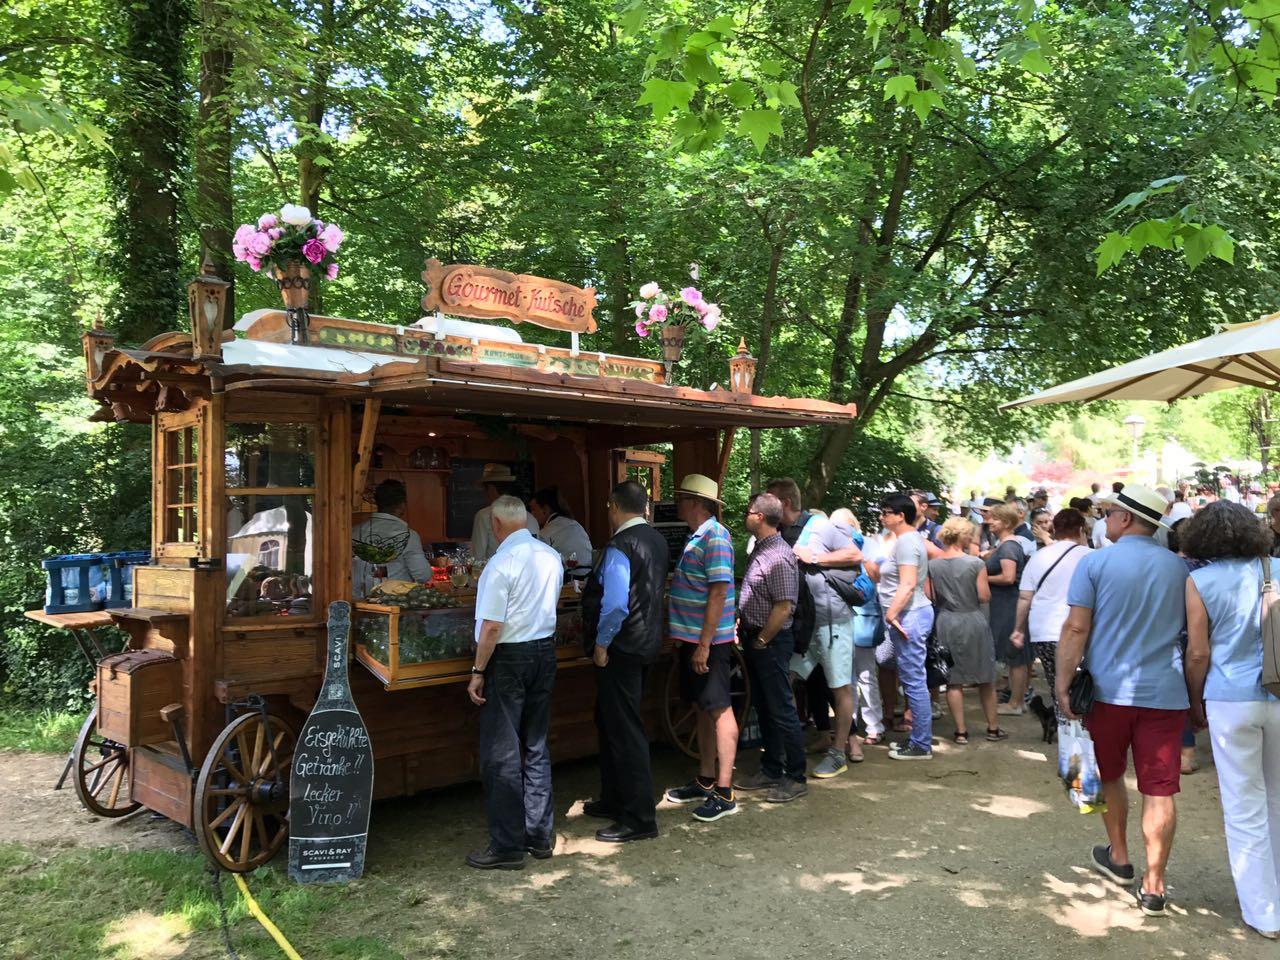 gartenfest hanau 2017 im park wilhelmsthal bei kassel. Black Bedroom Furniture Sets. Home Design Ideas